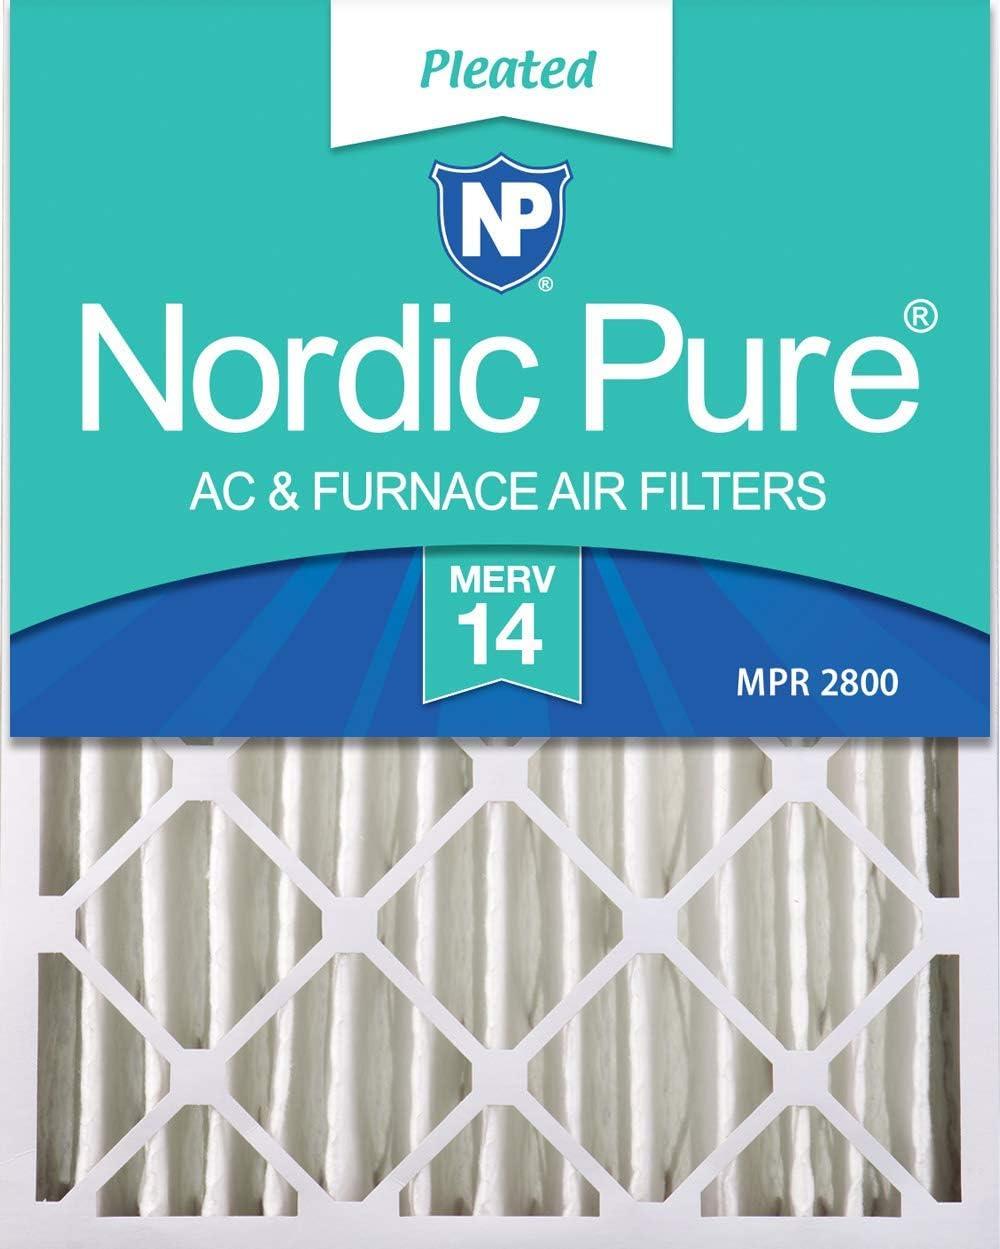 Nordic Pure 20x24x4 (3-5/8 Actual Depth) MERV 14 Pleated AC Furnace Air Filters, 6 PACK, 6 PACK (Renewed)